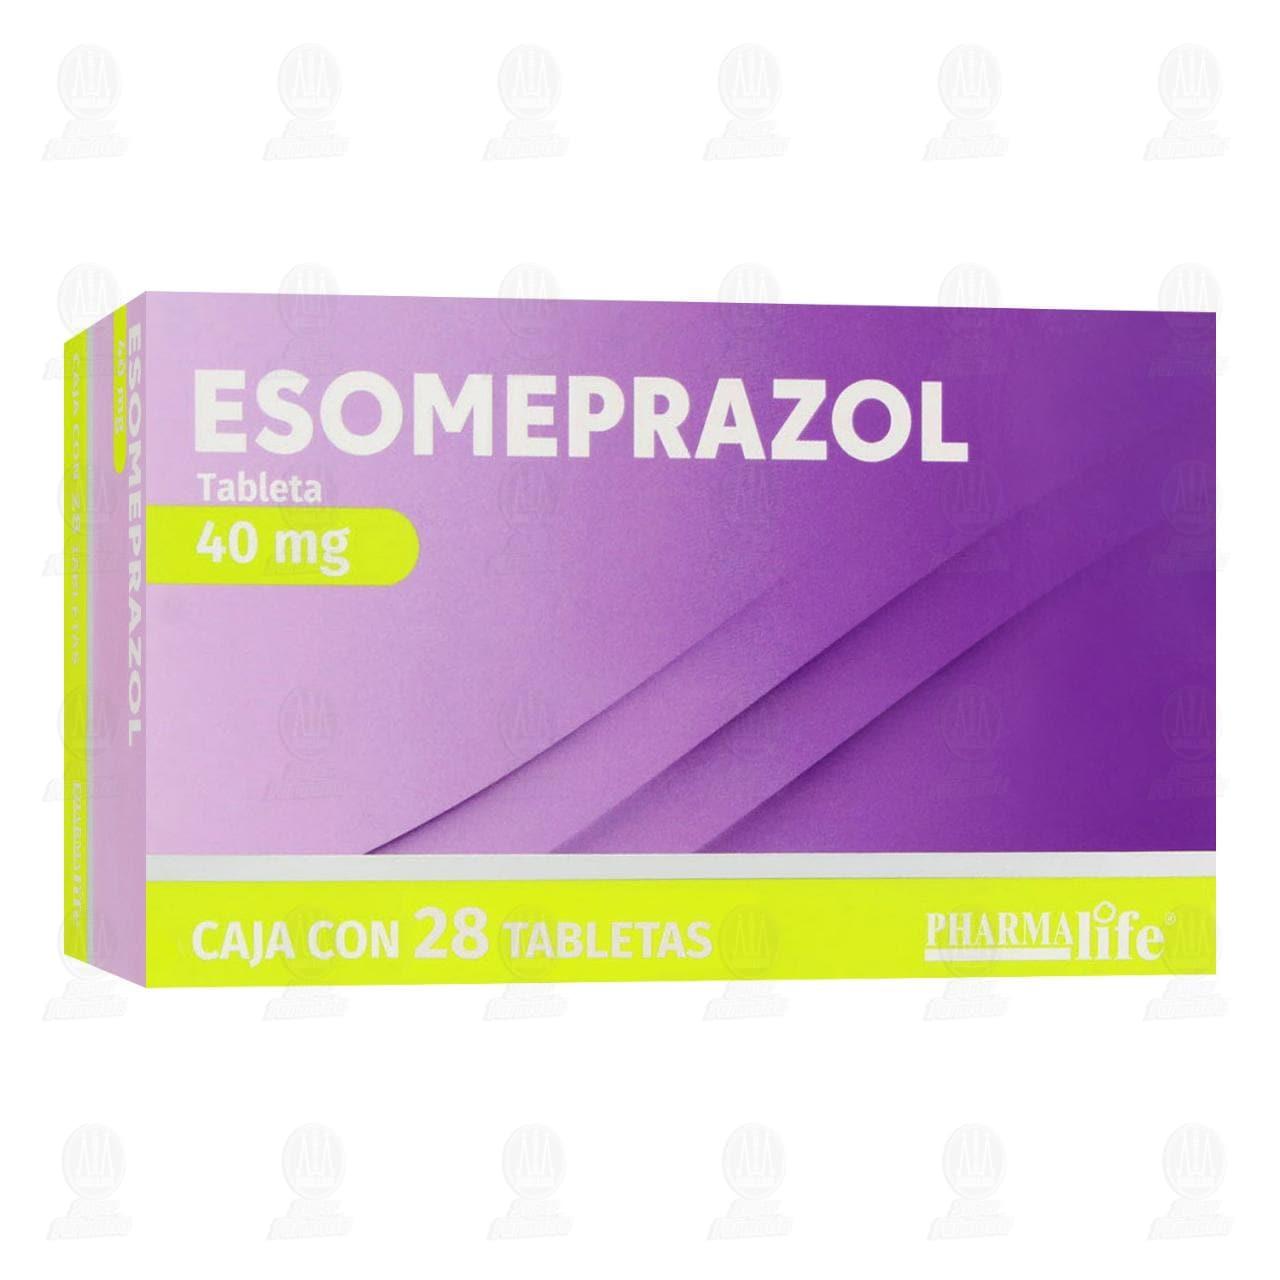 Comprar Esomeprazol 40mg 28 Tabletas Pharmalife en Farmacias Guadalajara